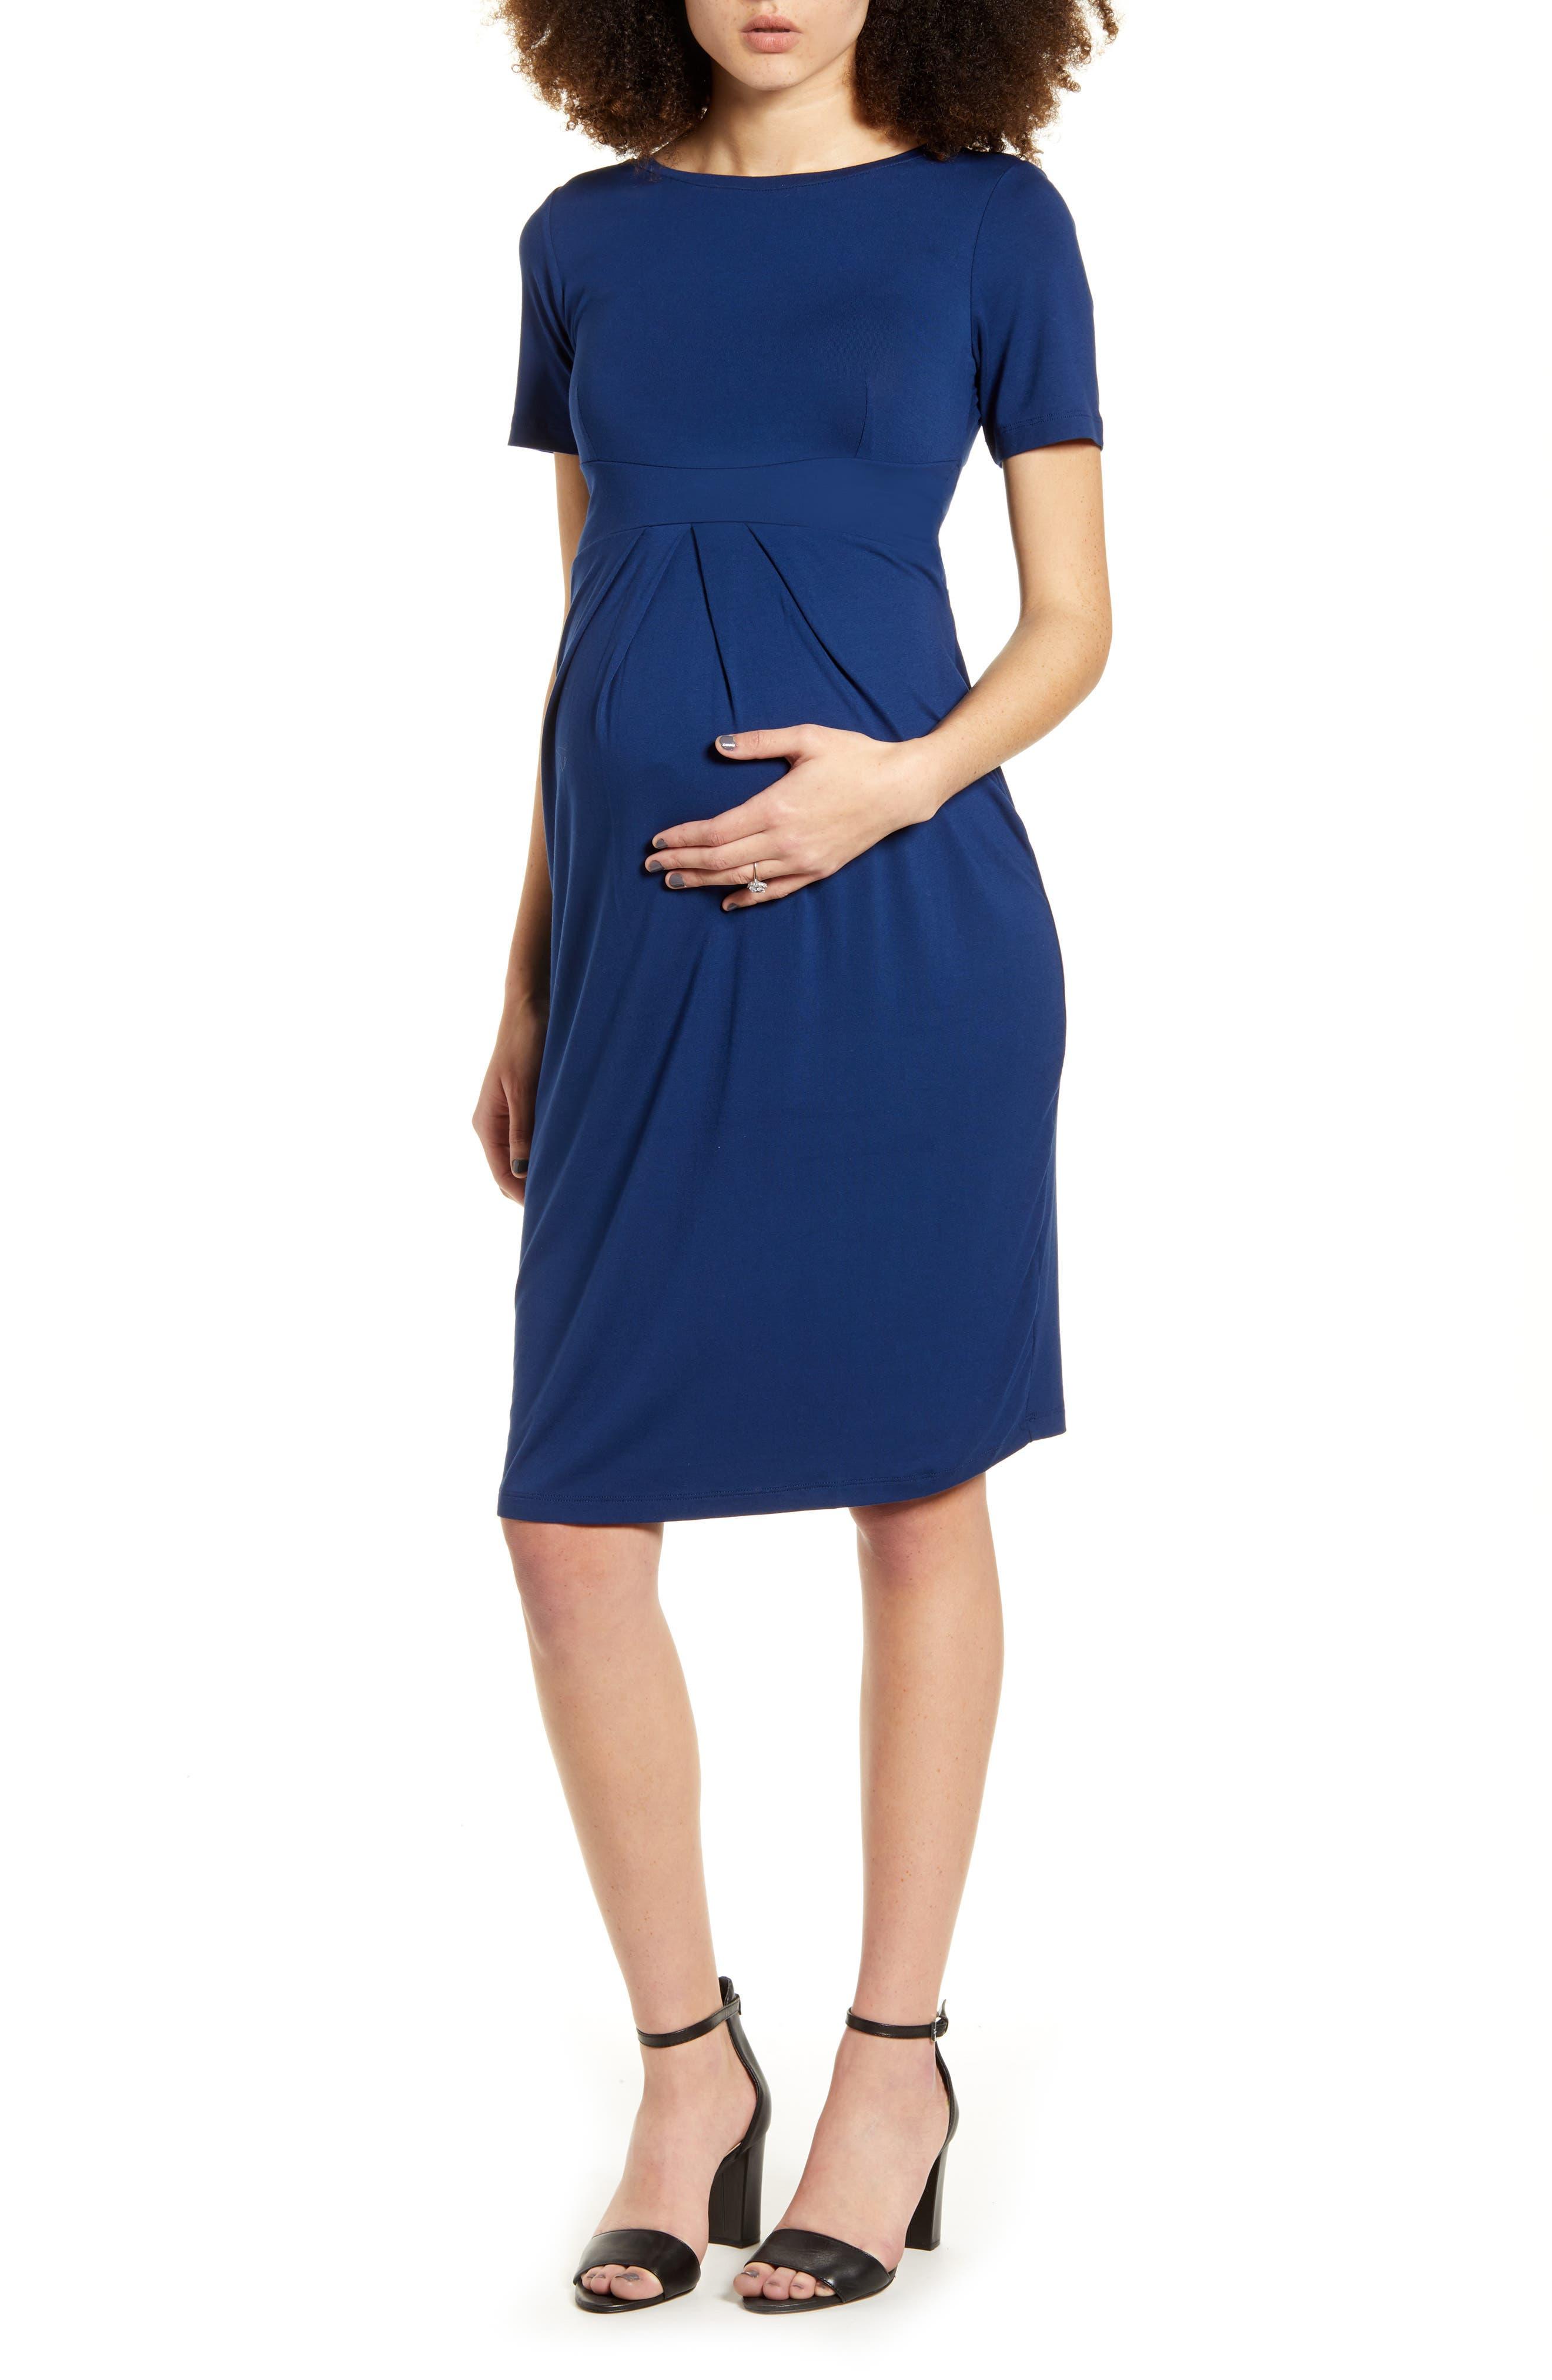 Catherine Maternity Dress